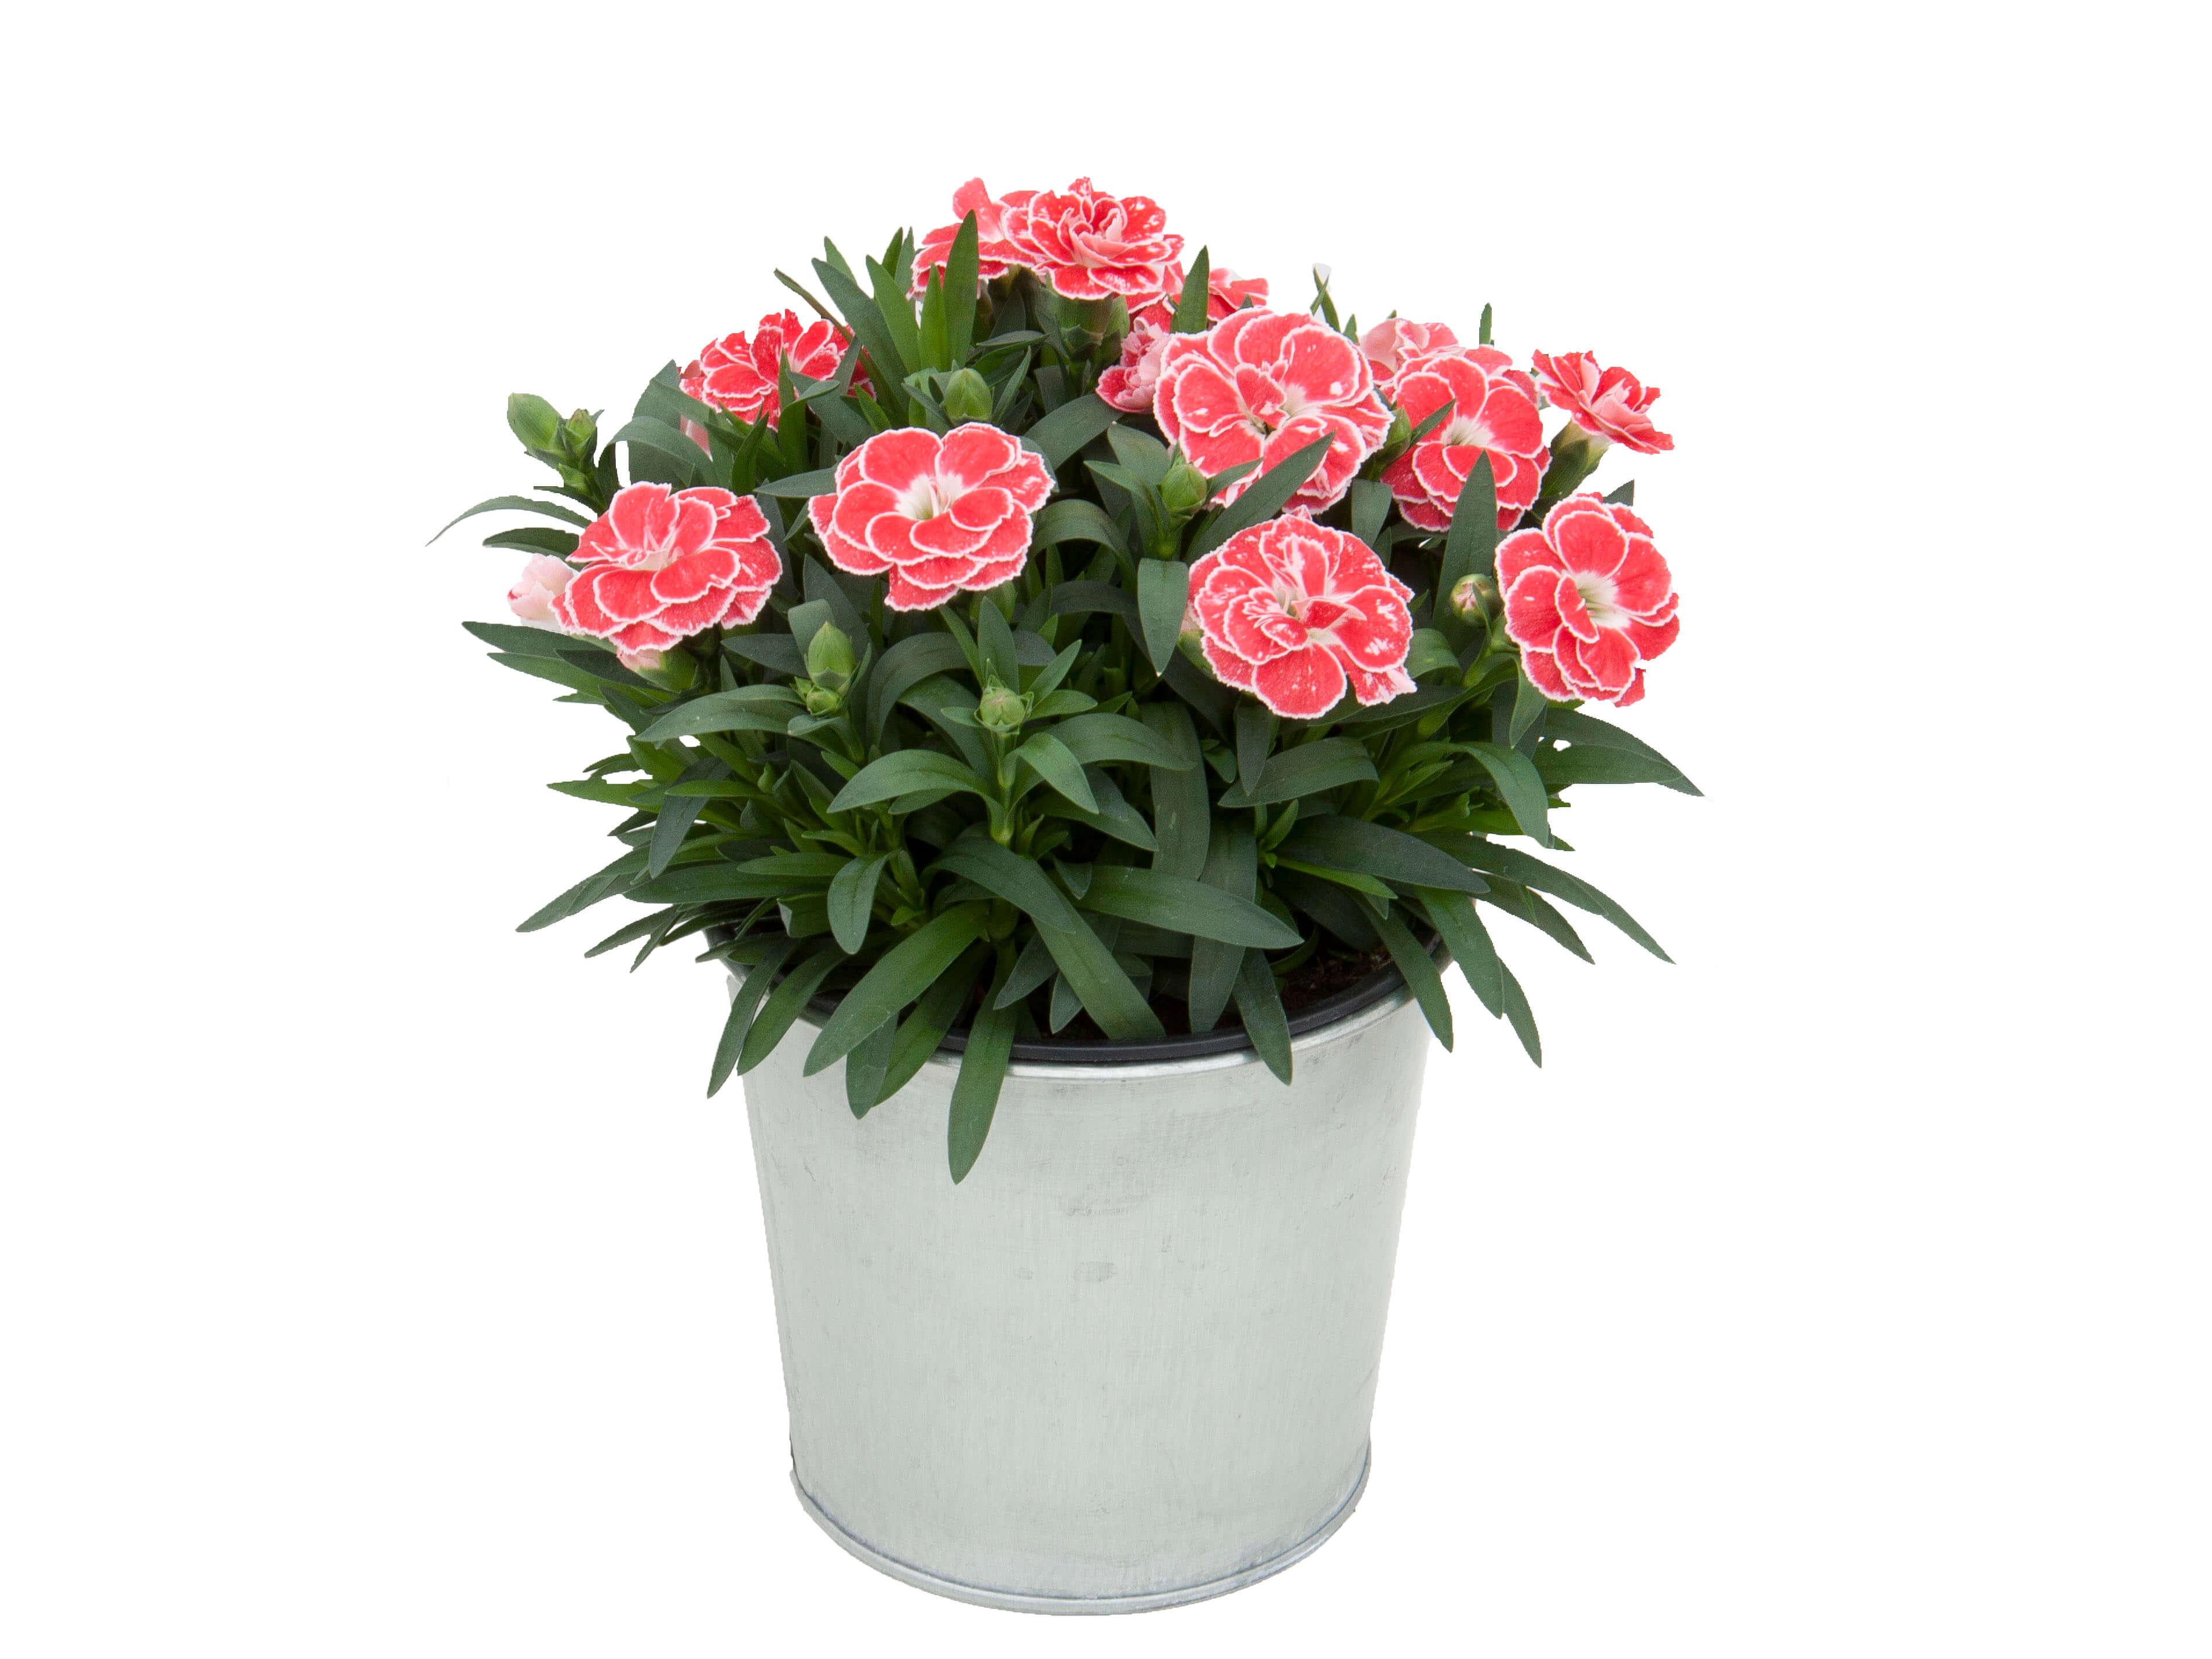 Nelke (Dianthus) T12 Oscar® 'White and Red' - gefüllt blühend